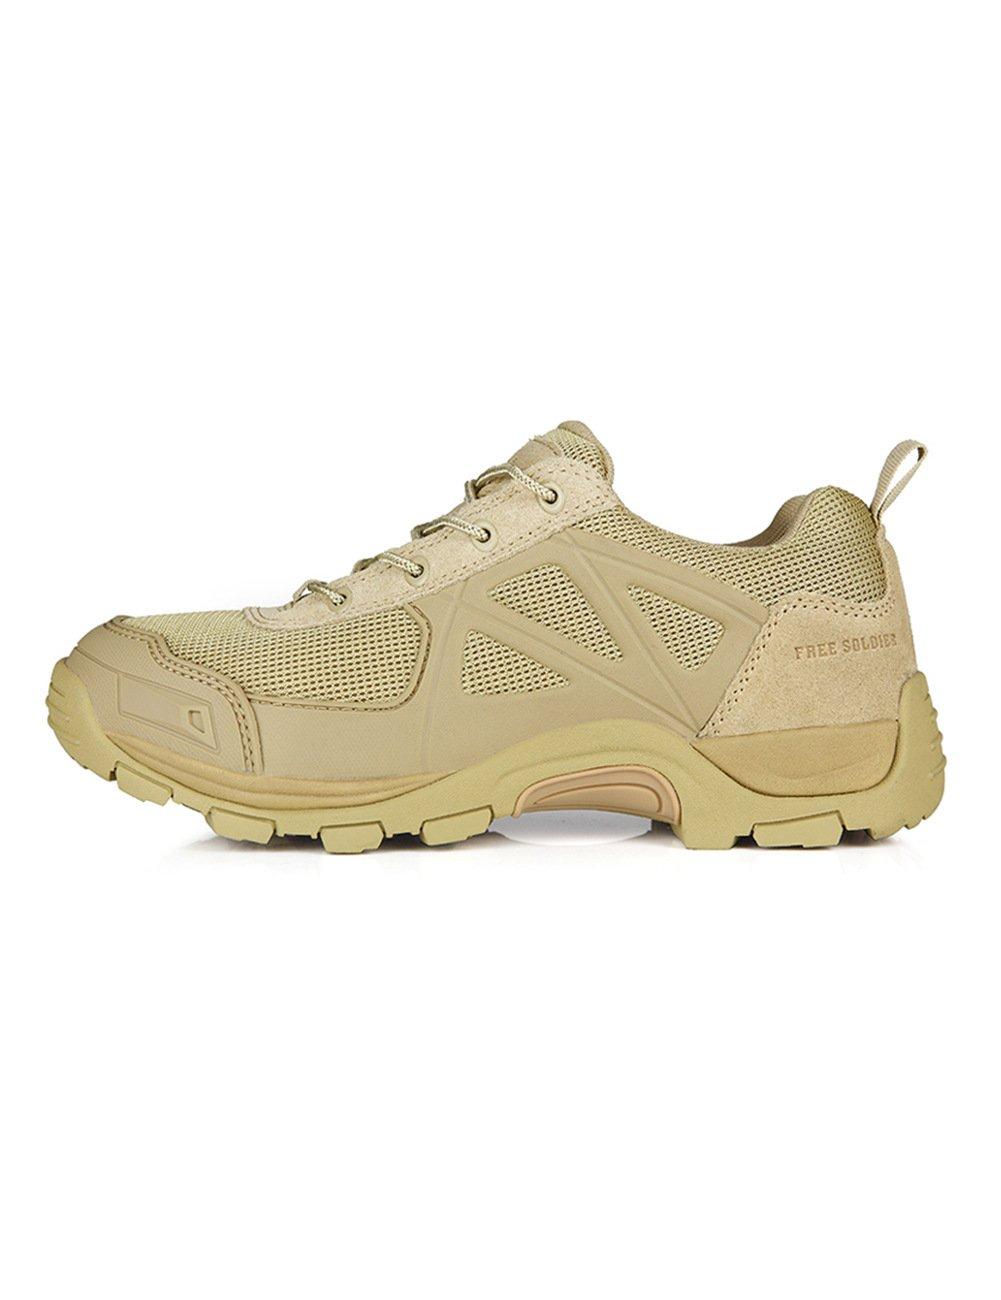 Free Soldierアウトドア急速なノンスリップキャンプハイキングブーツMountain all-terrainオフロード靴 B015O3C80W 7|サンド 色 サンド 色 7